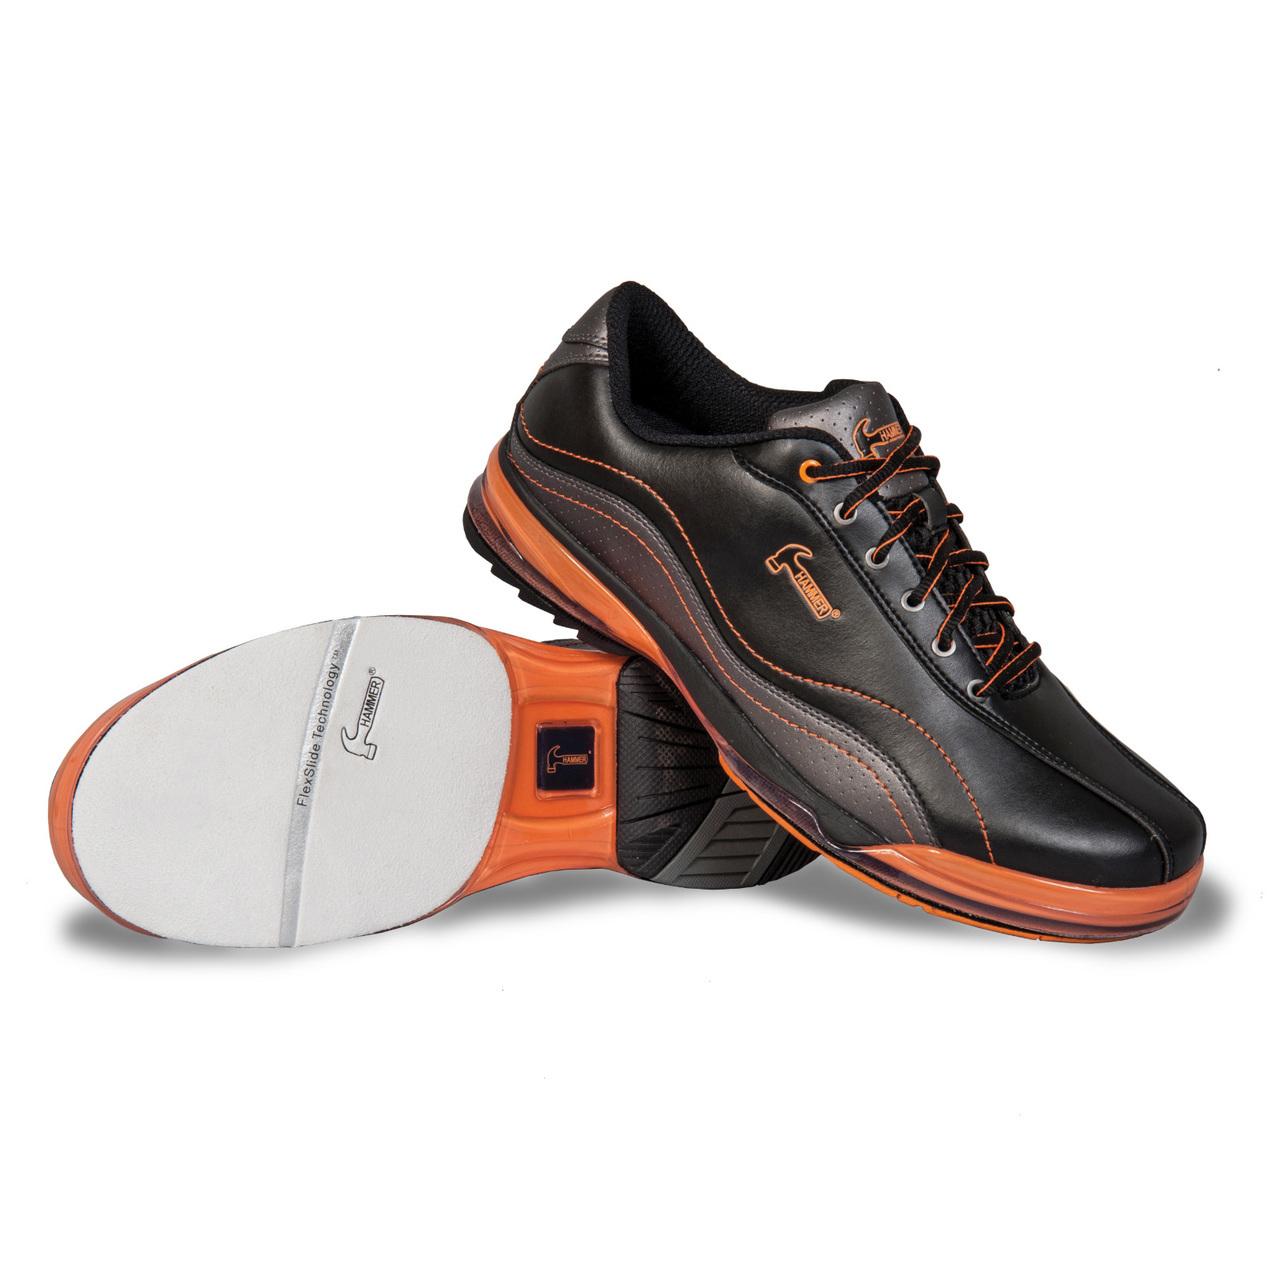 buy popular ab991 c33ea Bowling-Shop-Berlin24 - Bowlingschuhe - Hammer - Force ...